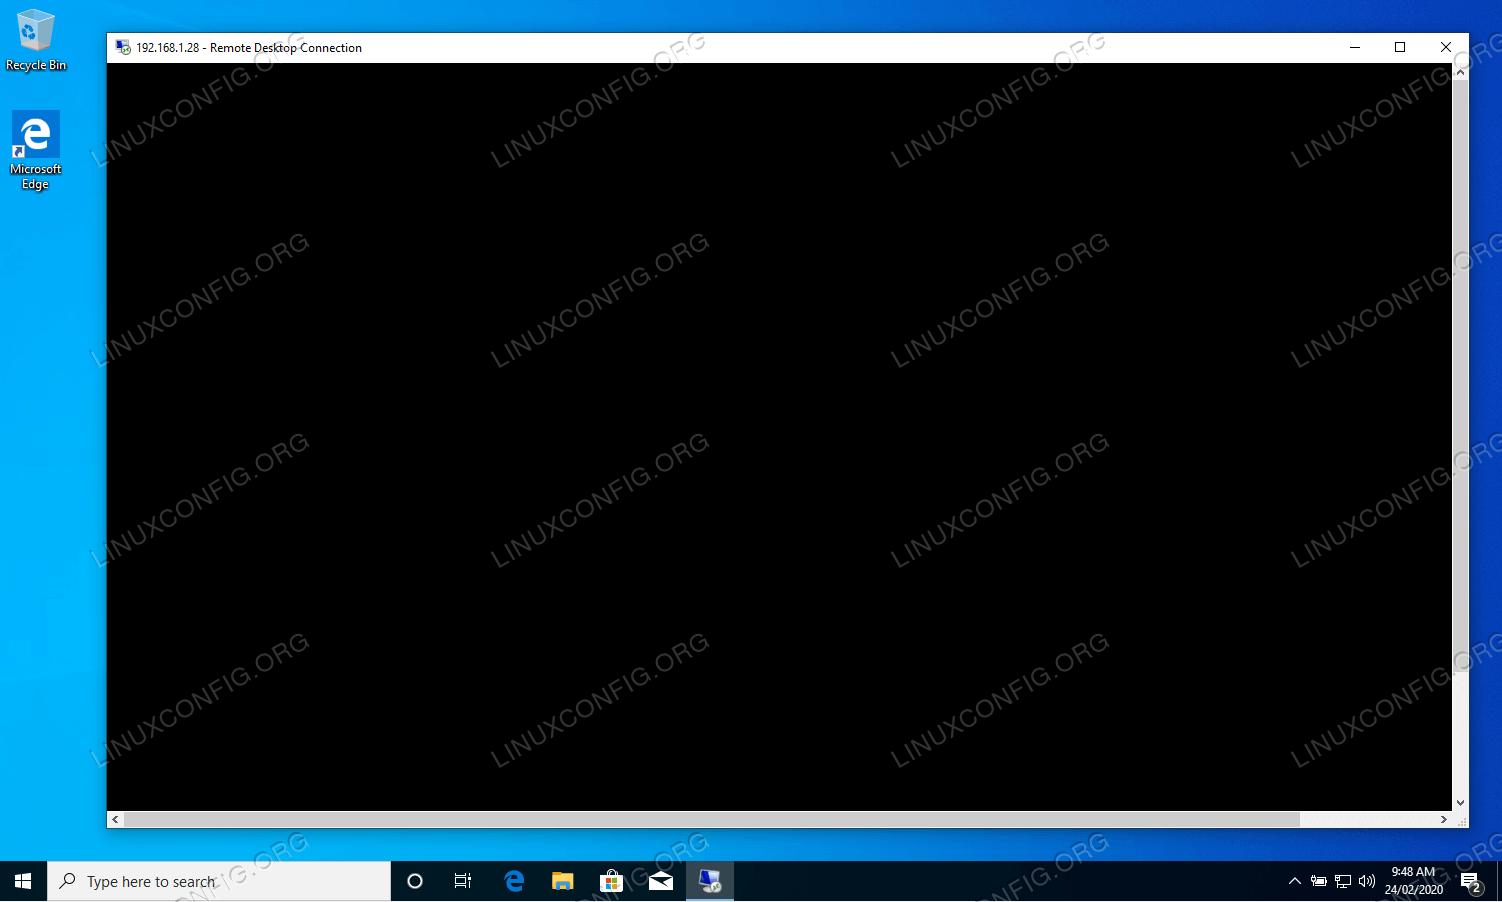 xrdp black screen bug